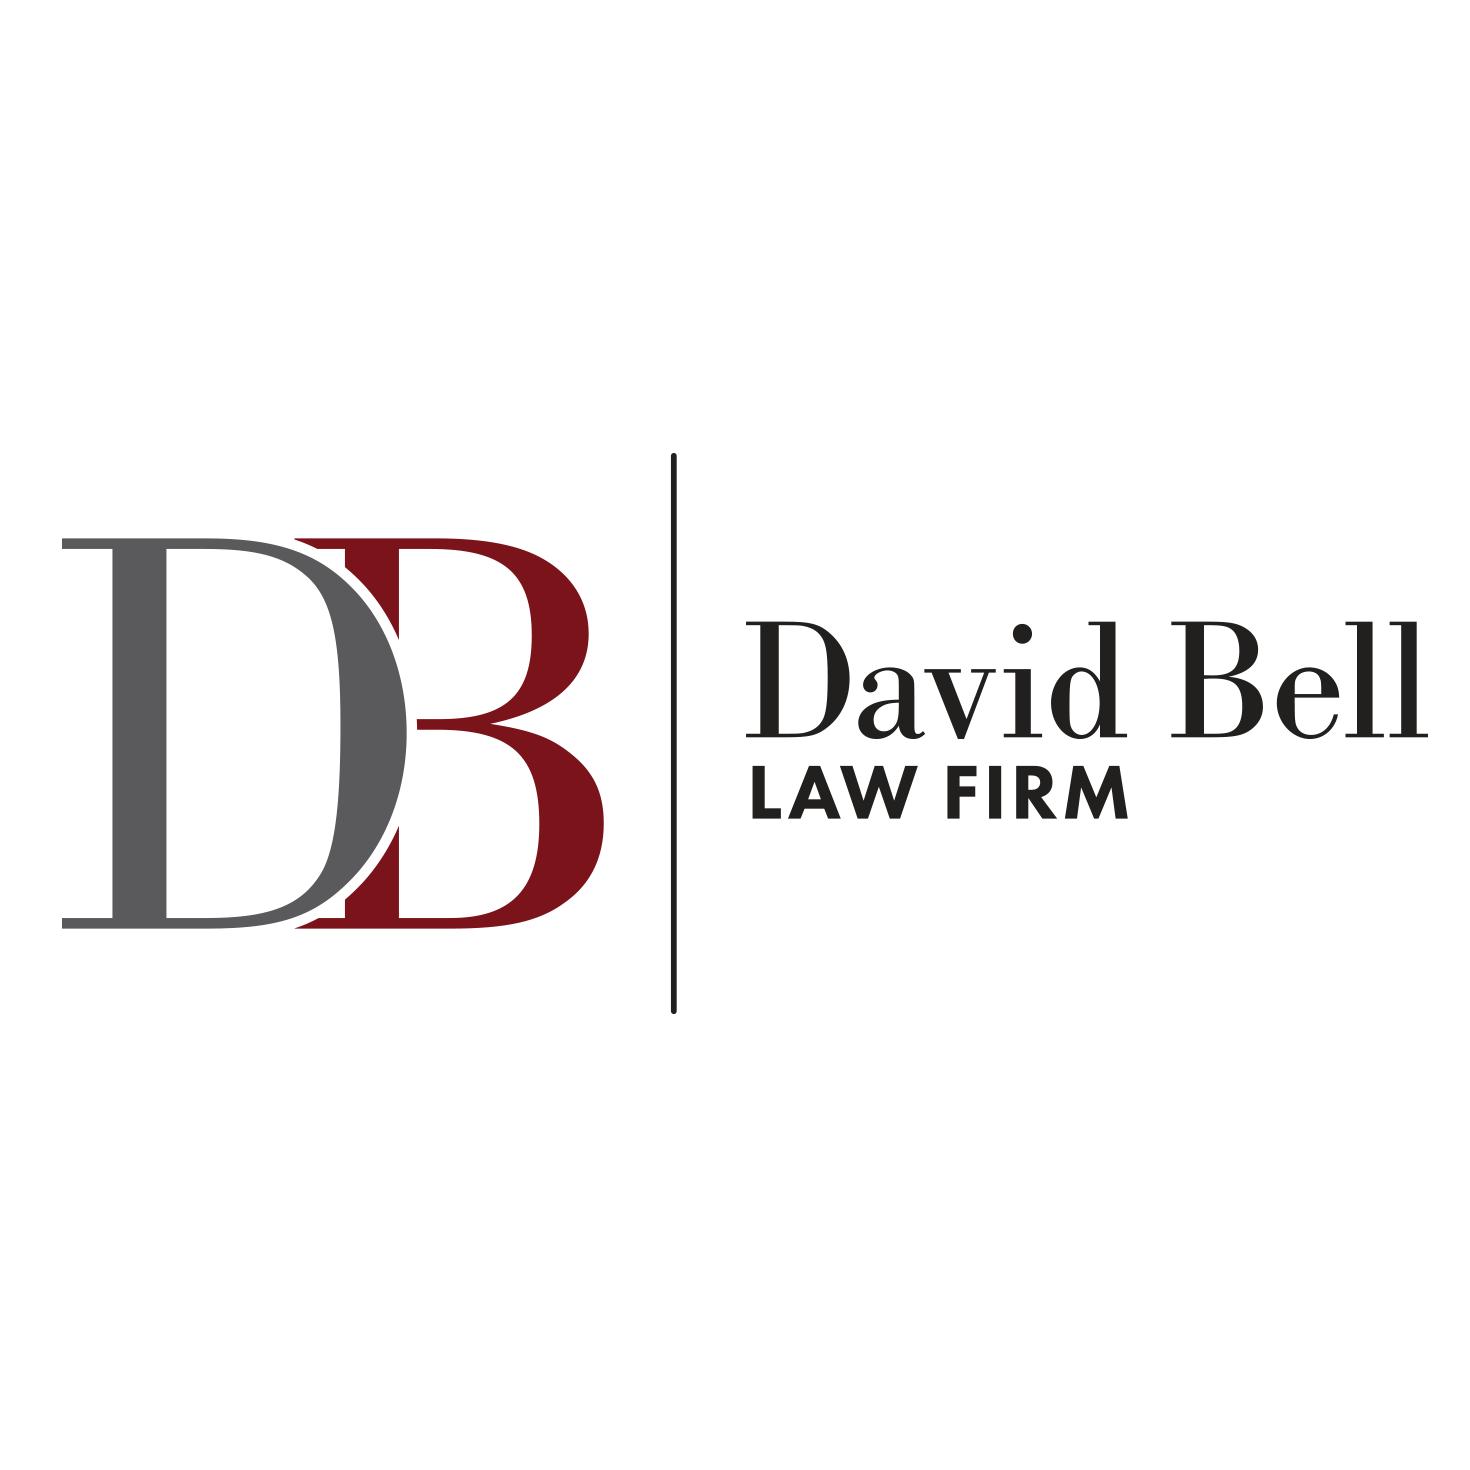 David Bell Law Firm